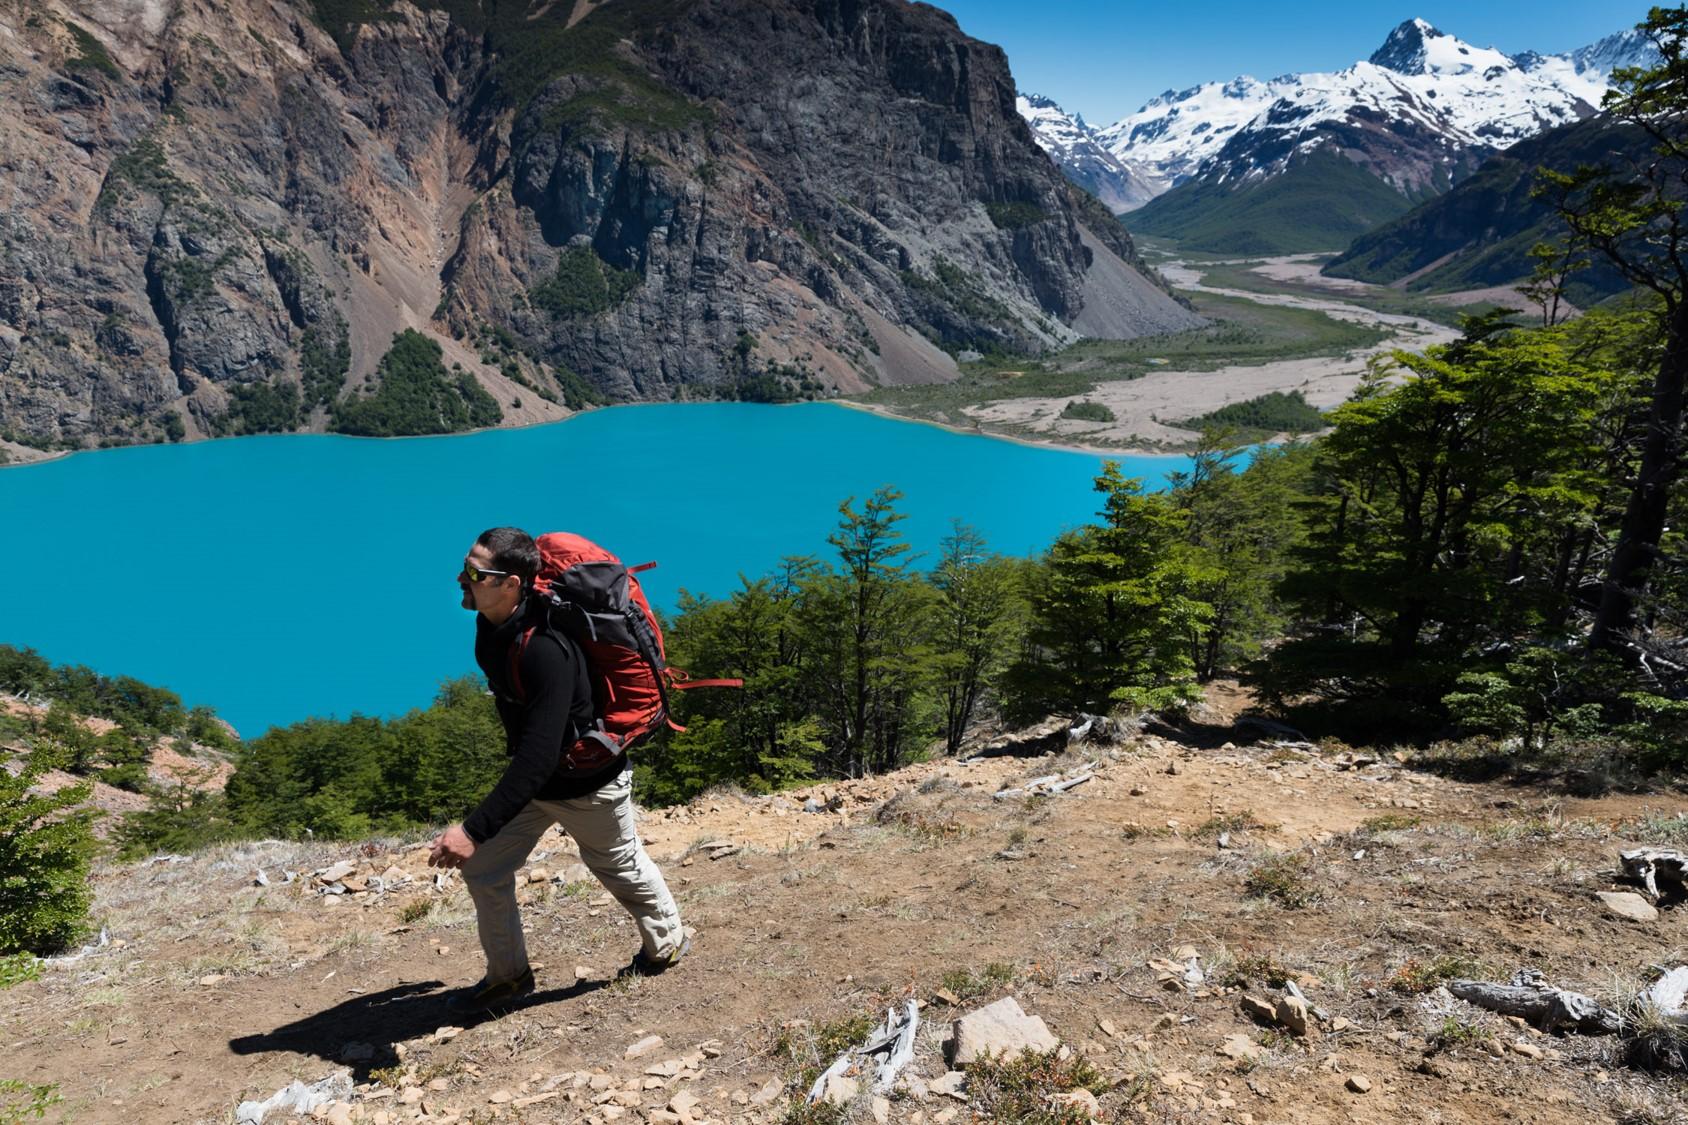 La Gloria Pass, Valle Hermoso - Patagonia National Park Chile.